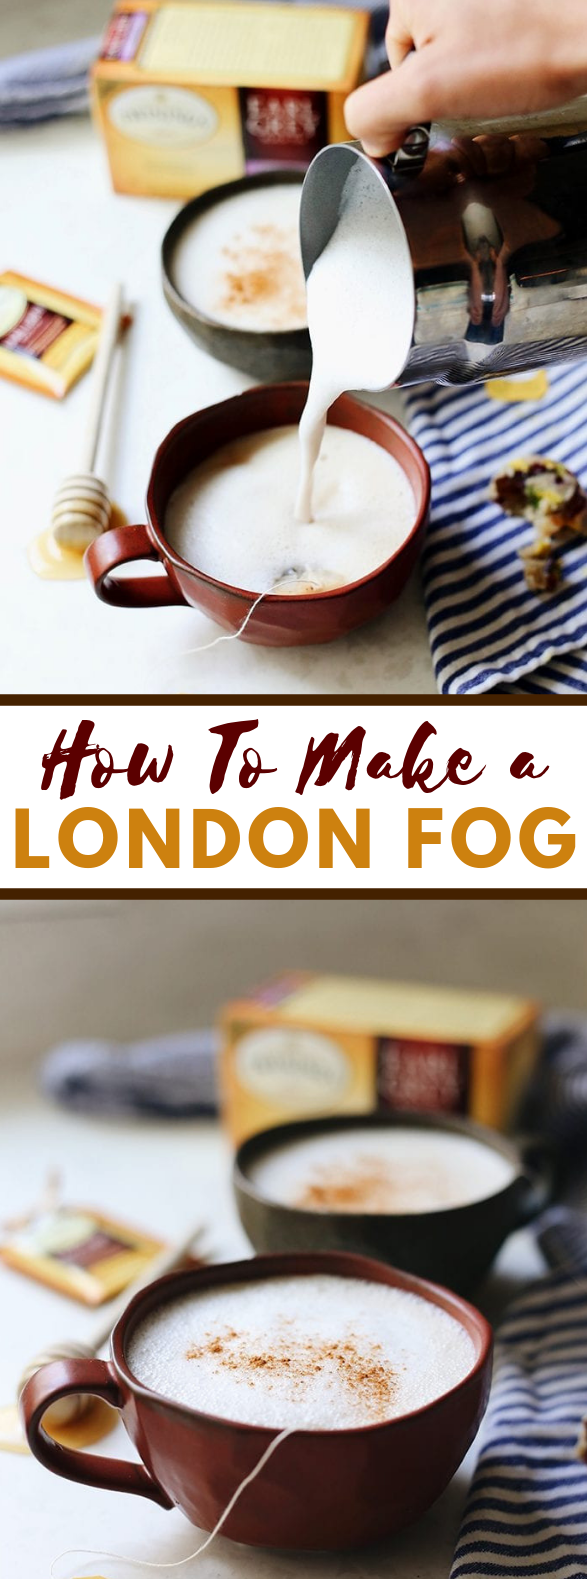 HOW TO MAKE A LONDON FOG #drinks #glutenfree